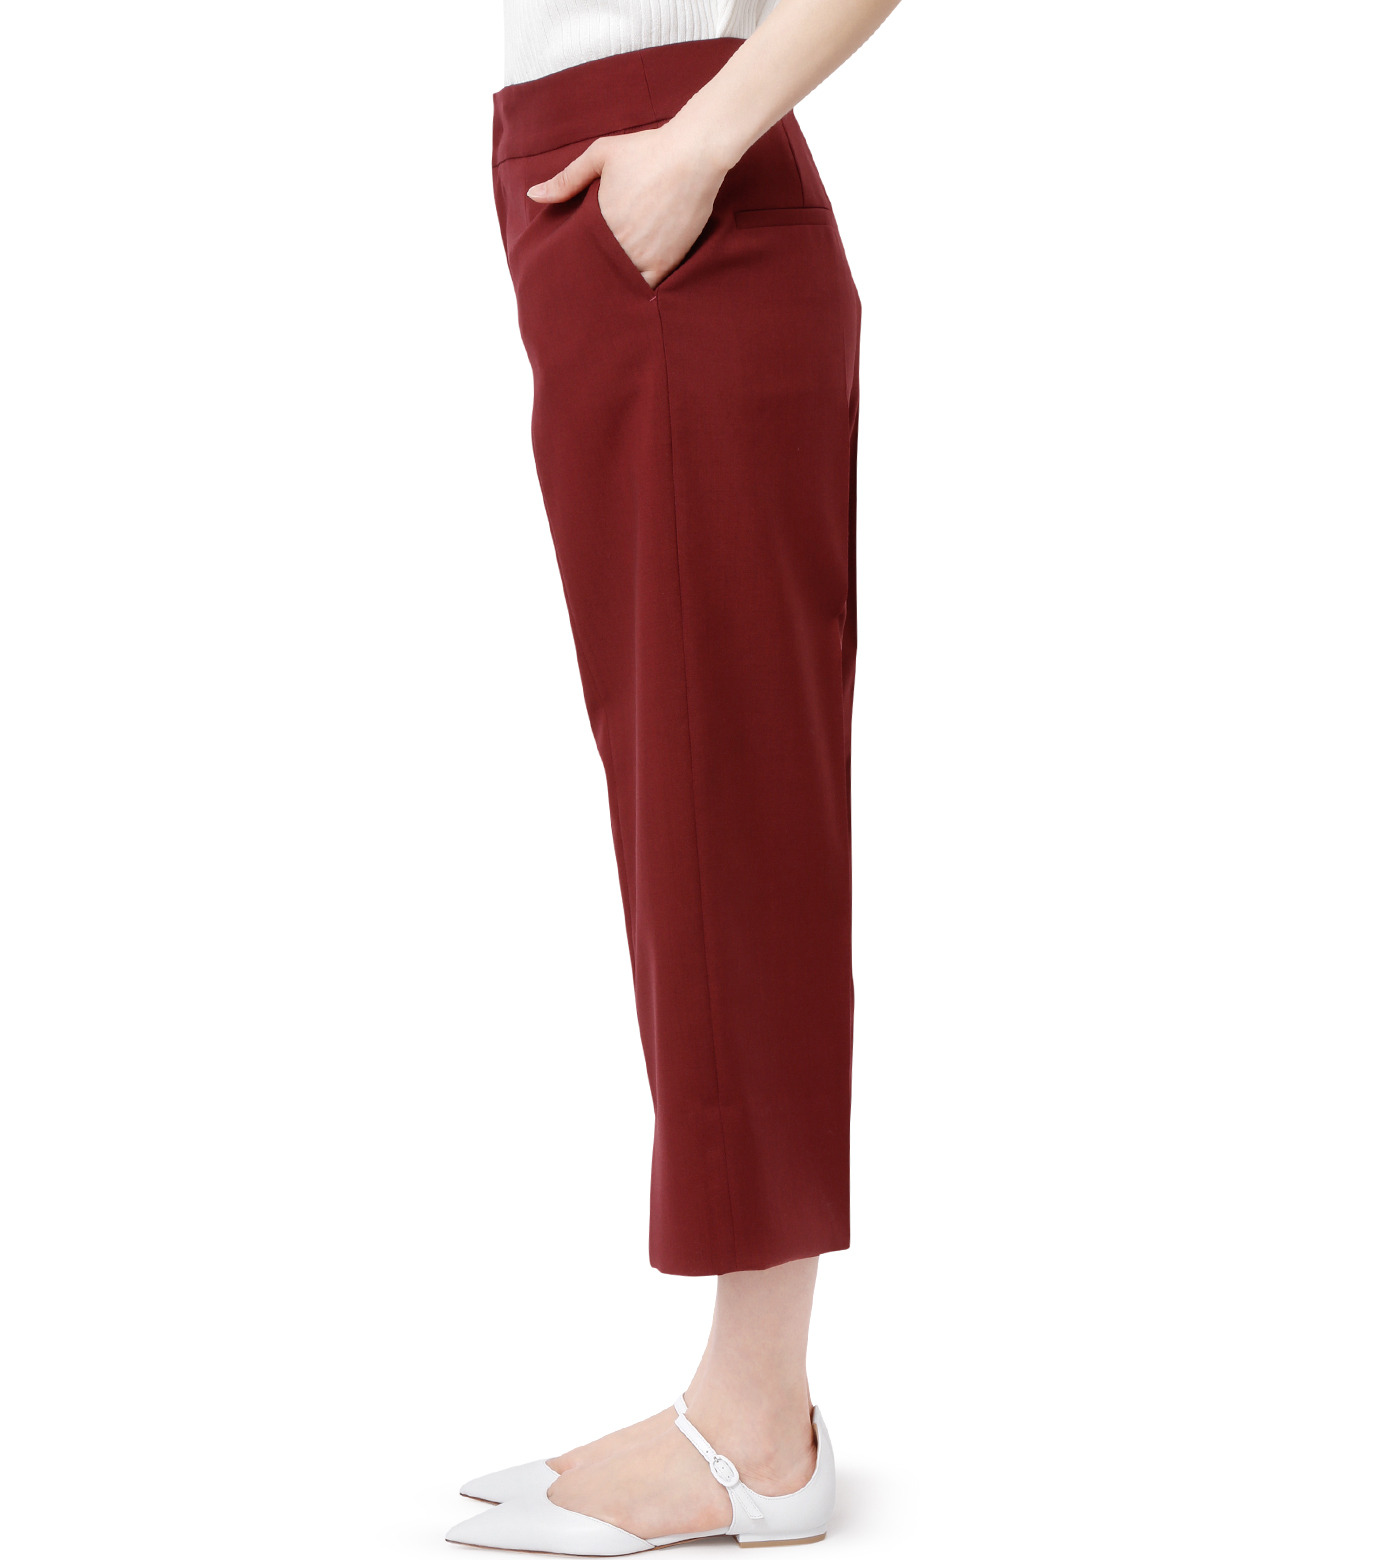 LE CIEL BLEU(ルシェルブルー)のサマーウールストレートパンツ-BORDEAUX(パンツ/pants)-18A68001 拡大詳細画像2